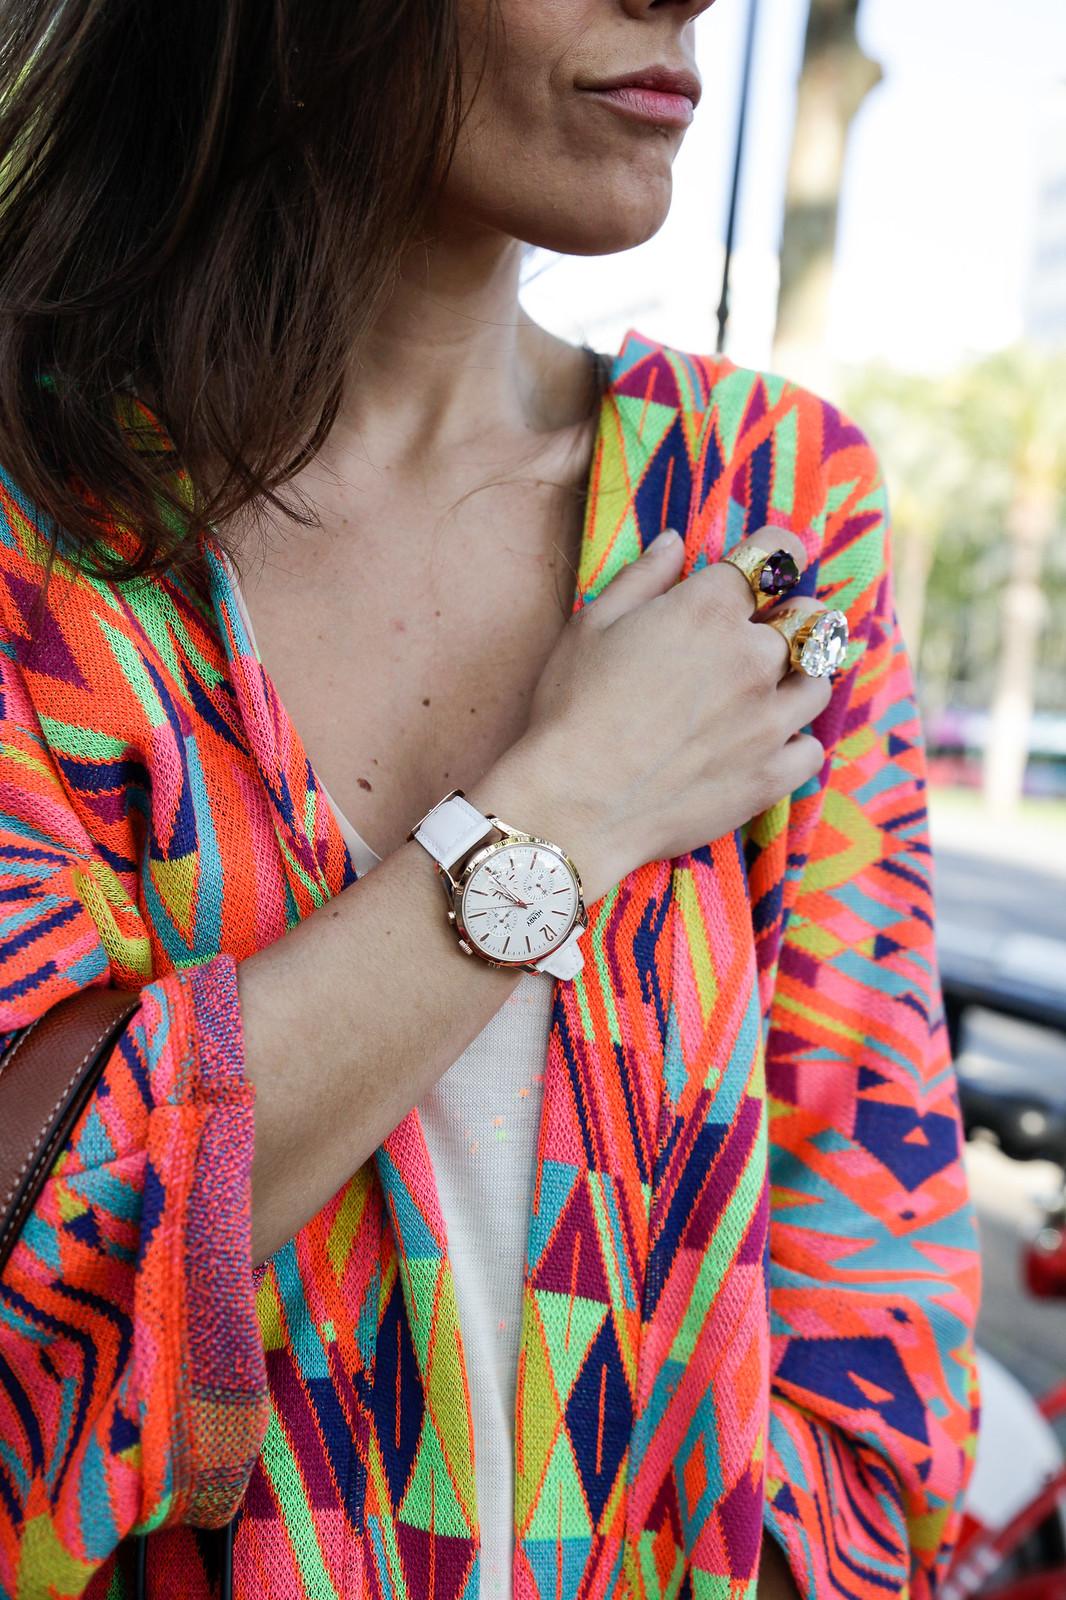 03_kimono_look_street_style_barcelona_theguestgirl_pepe_moll_ruga_caroline_svedbom_kapten_son